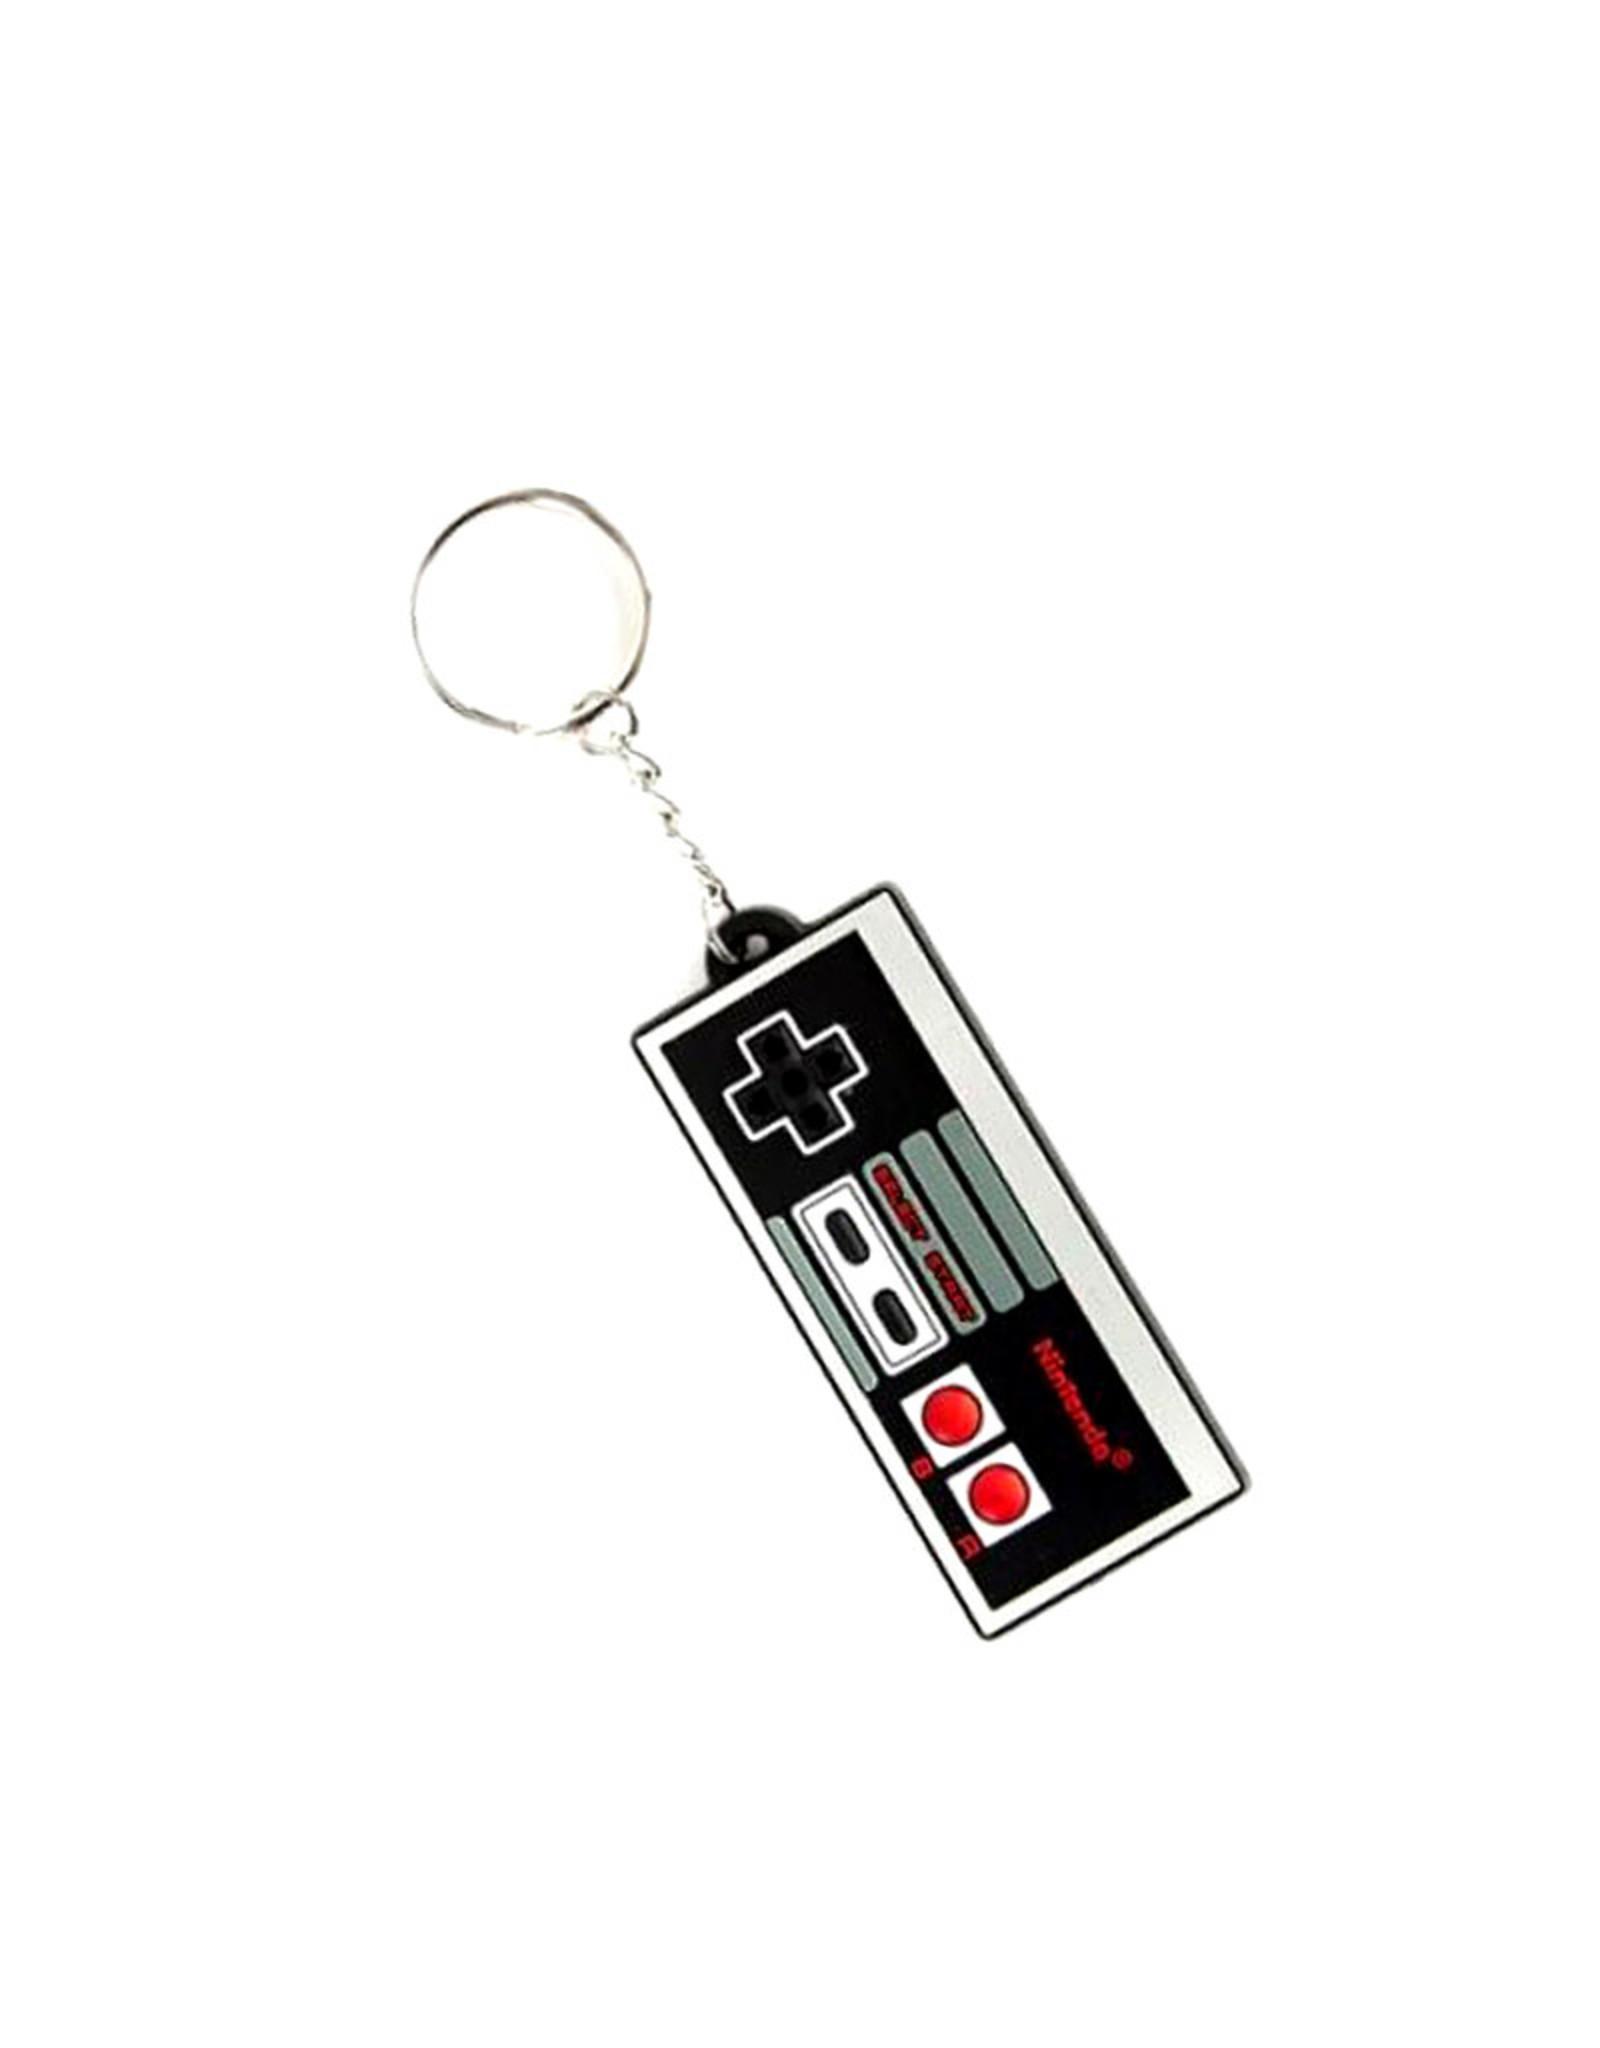 Nintendo Nintendo ( Keychain ) Flexible Joystick